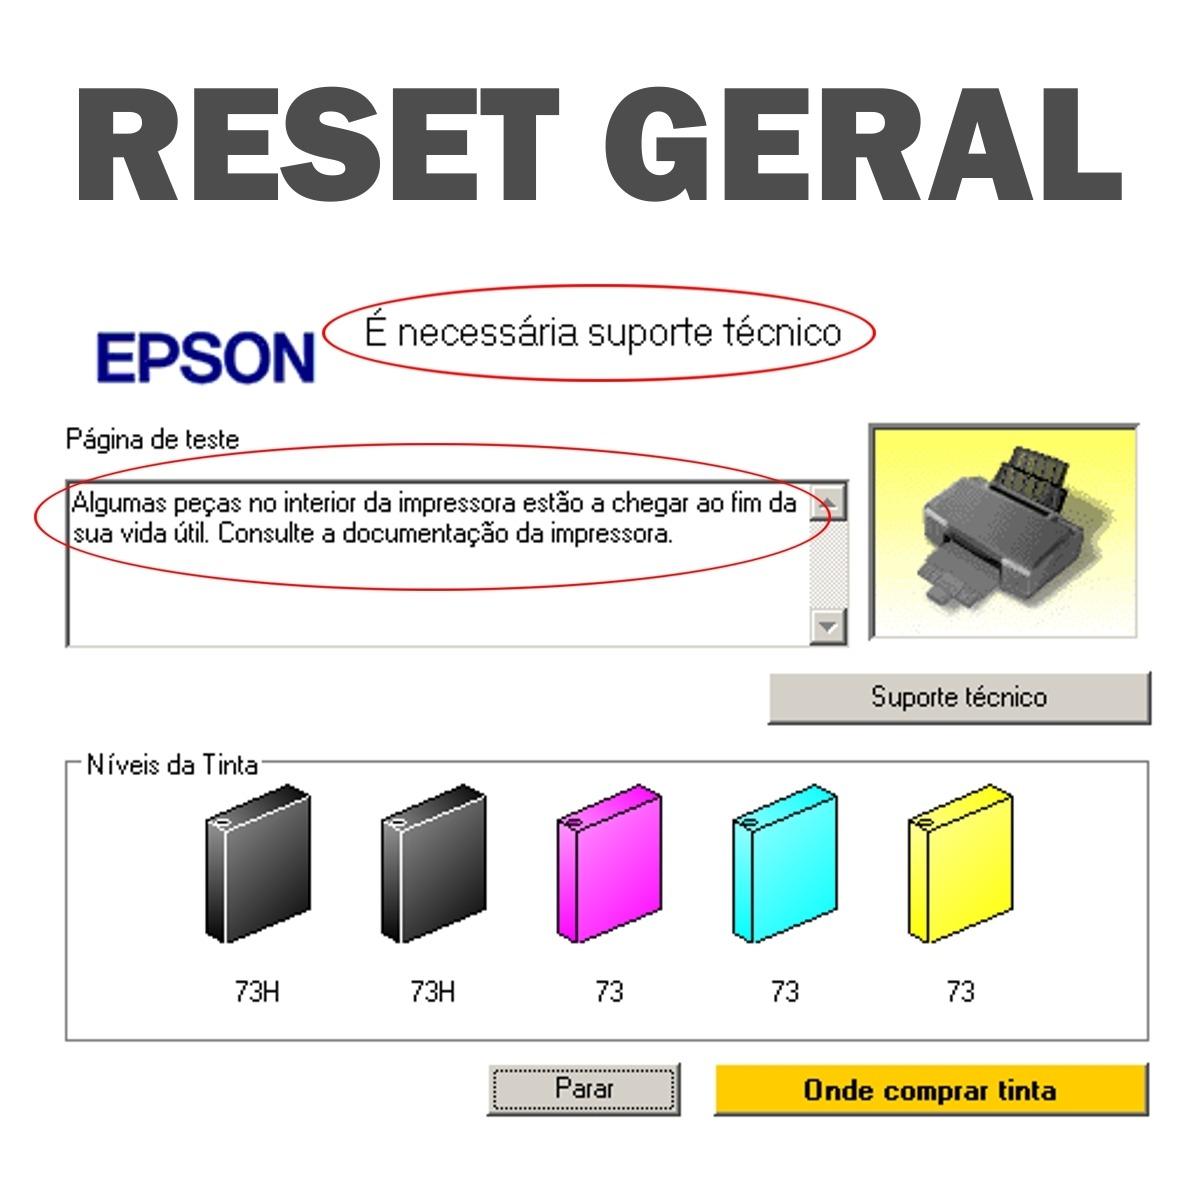 Epson L3150 Scanner Driver